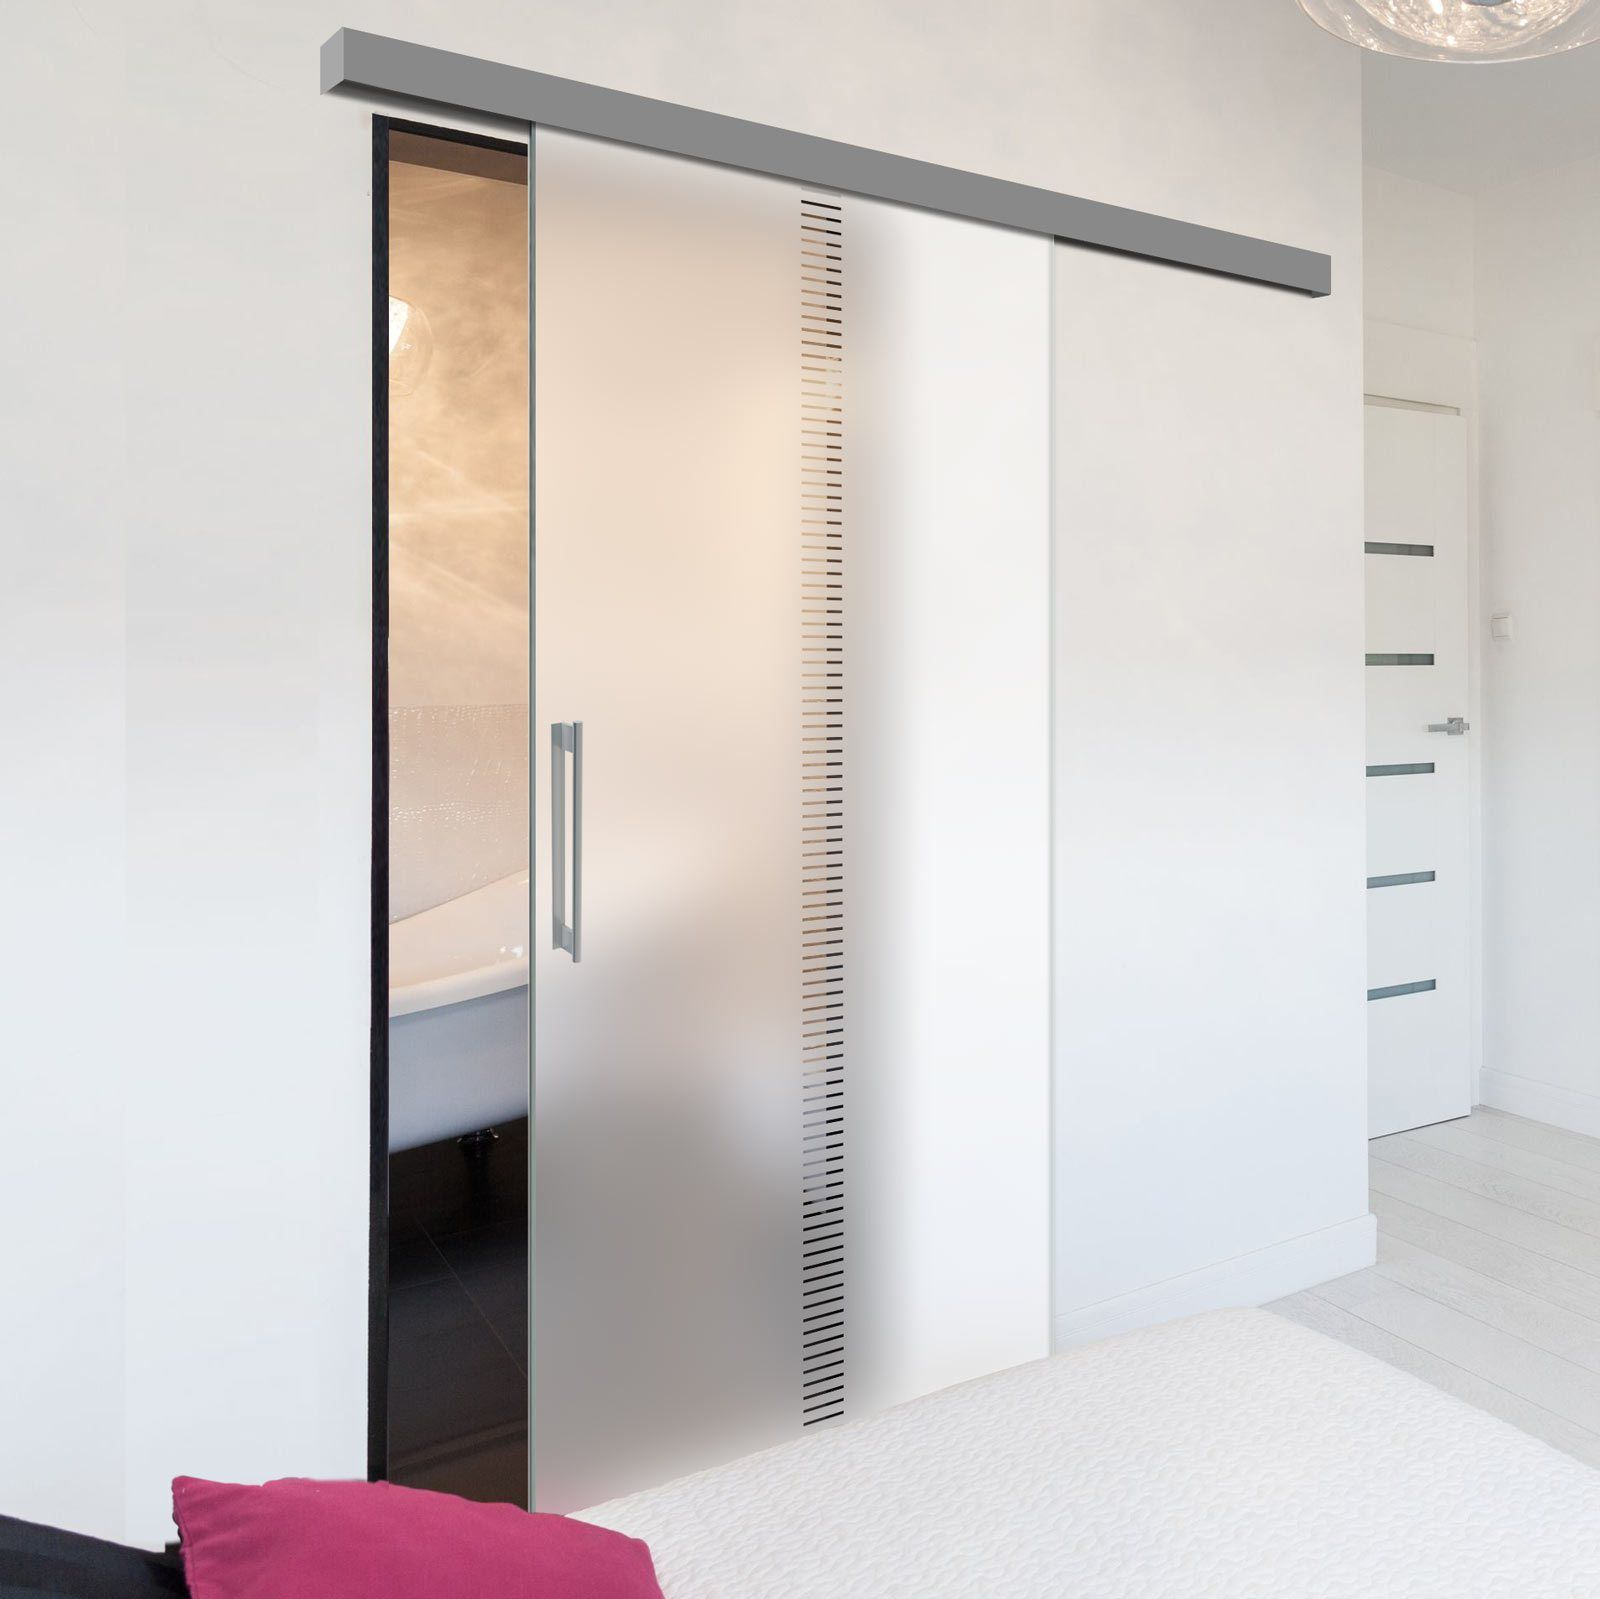 Single Glass Sliding Door Spott 8mm Obscure Glass Clear Printed Design Planeo 60 Pro Kit Sliding Glass Door Glass Door Internal Glass Sliding Doors